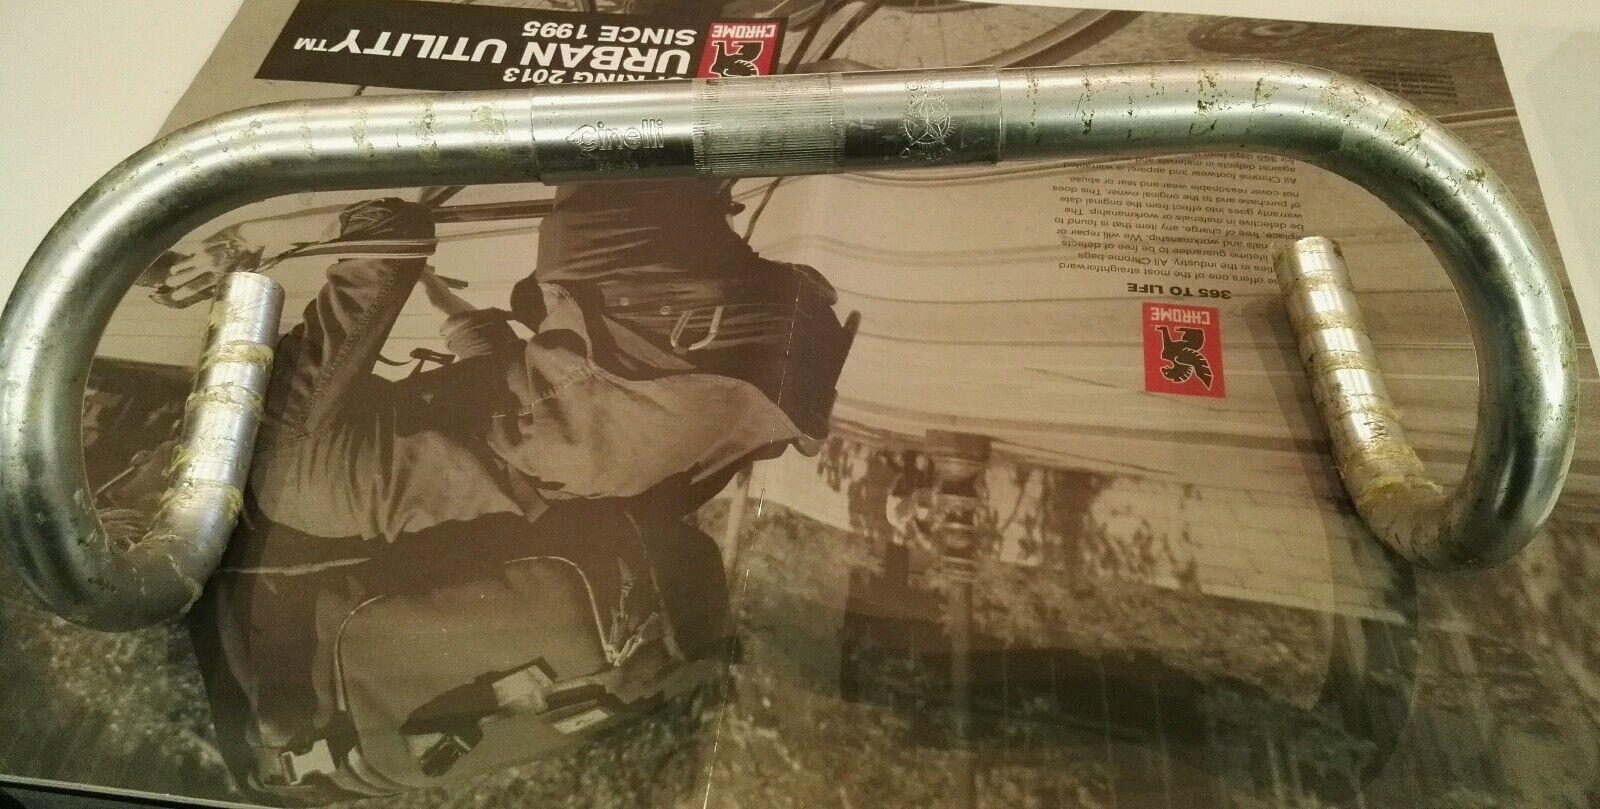 Manubrio Cinelli Giro d'Italia handlebar  Vintage anni 80  comprar mejor